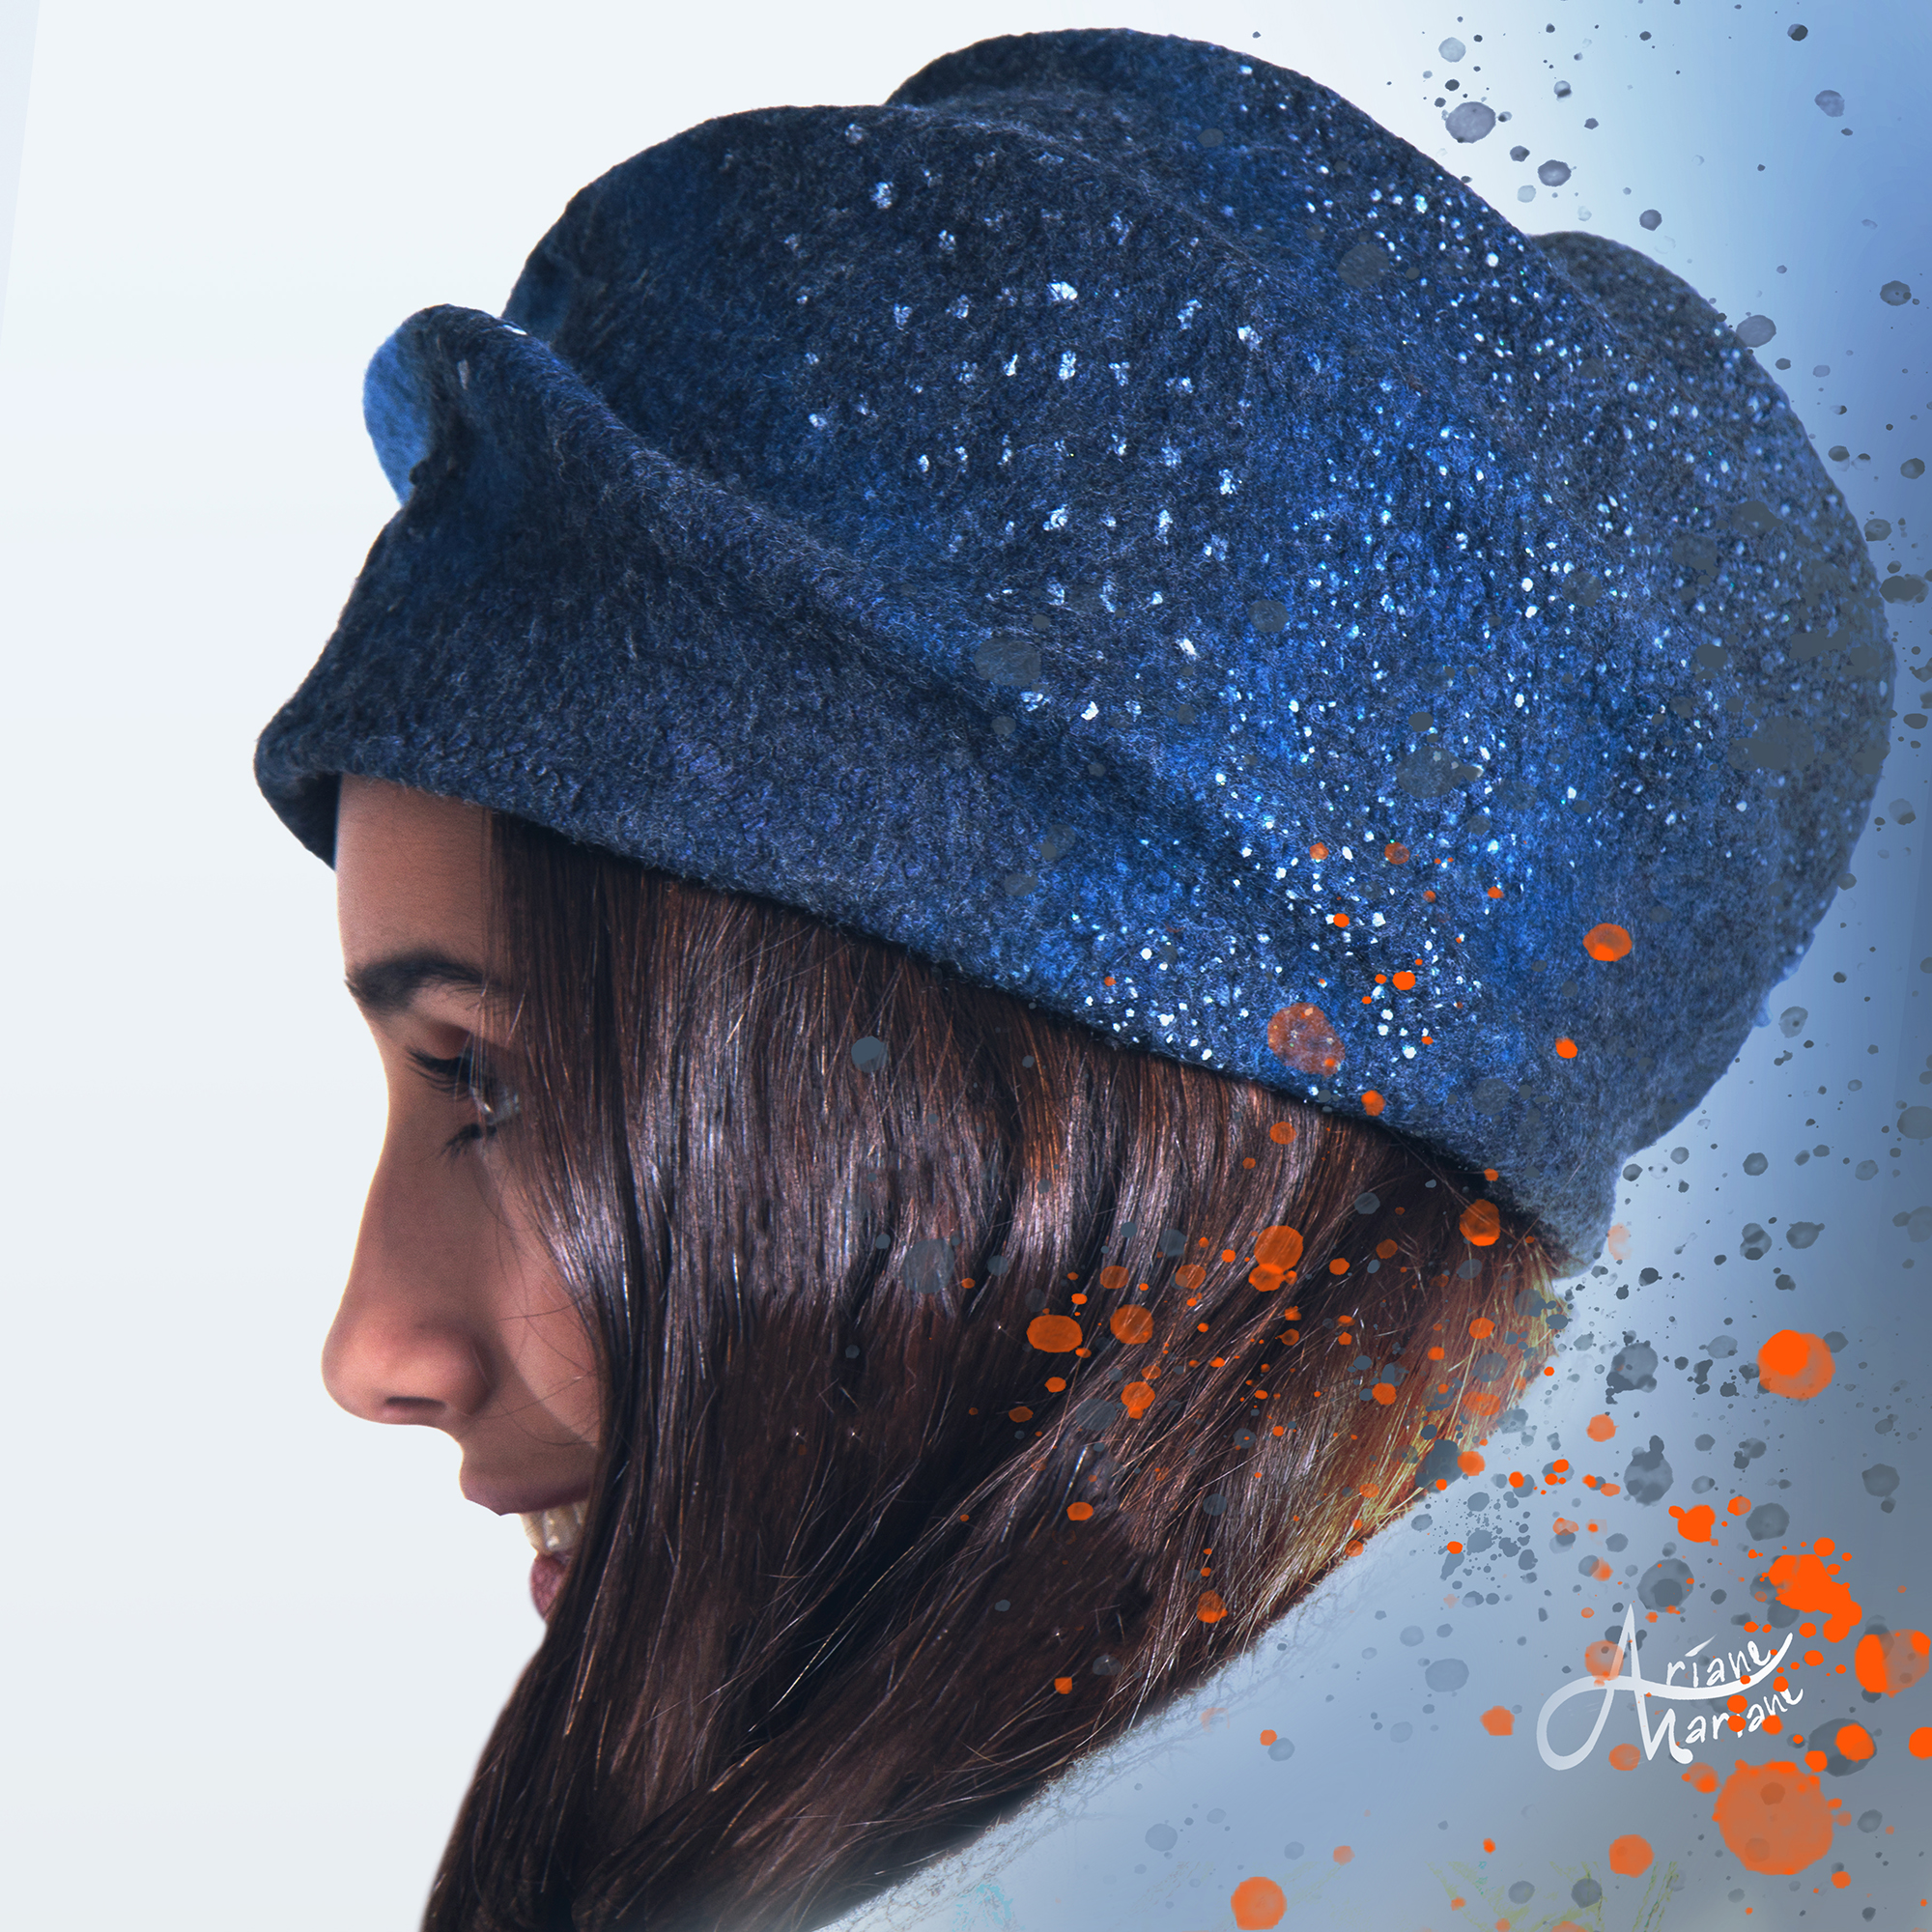 chapeau-feutre-femme-bleu-ariane-mariane-3kl.jpg